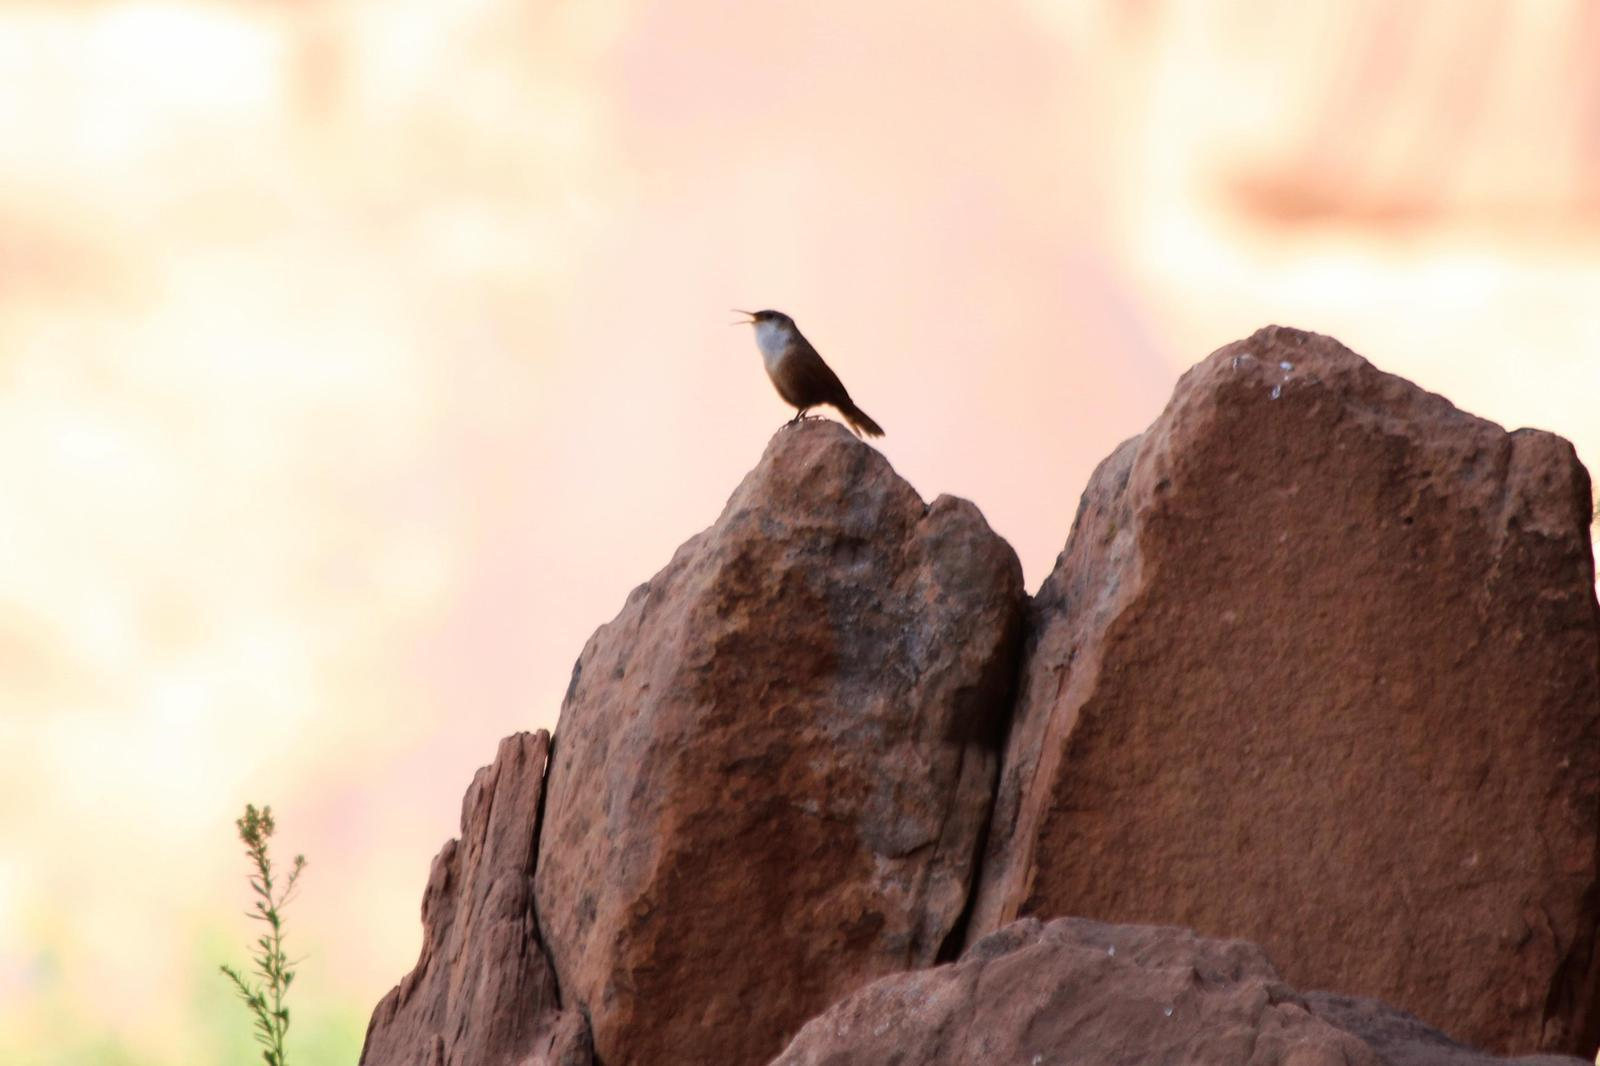 Canyon Wren Photo by Darrin Menzo